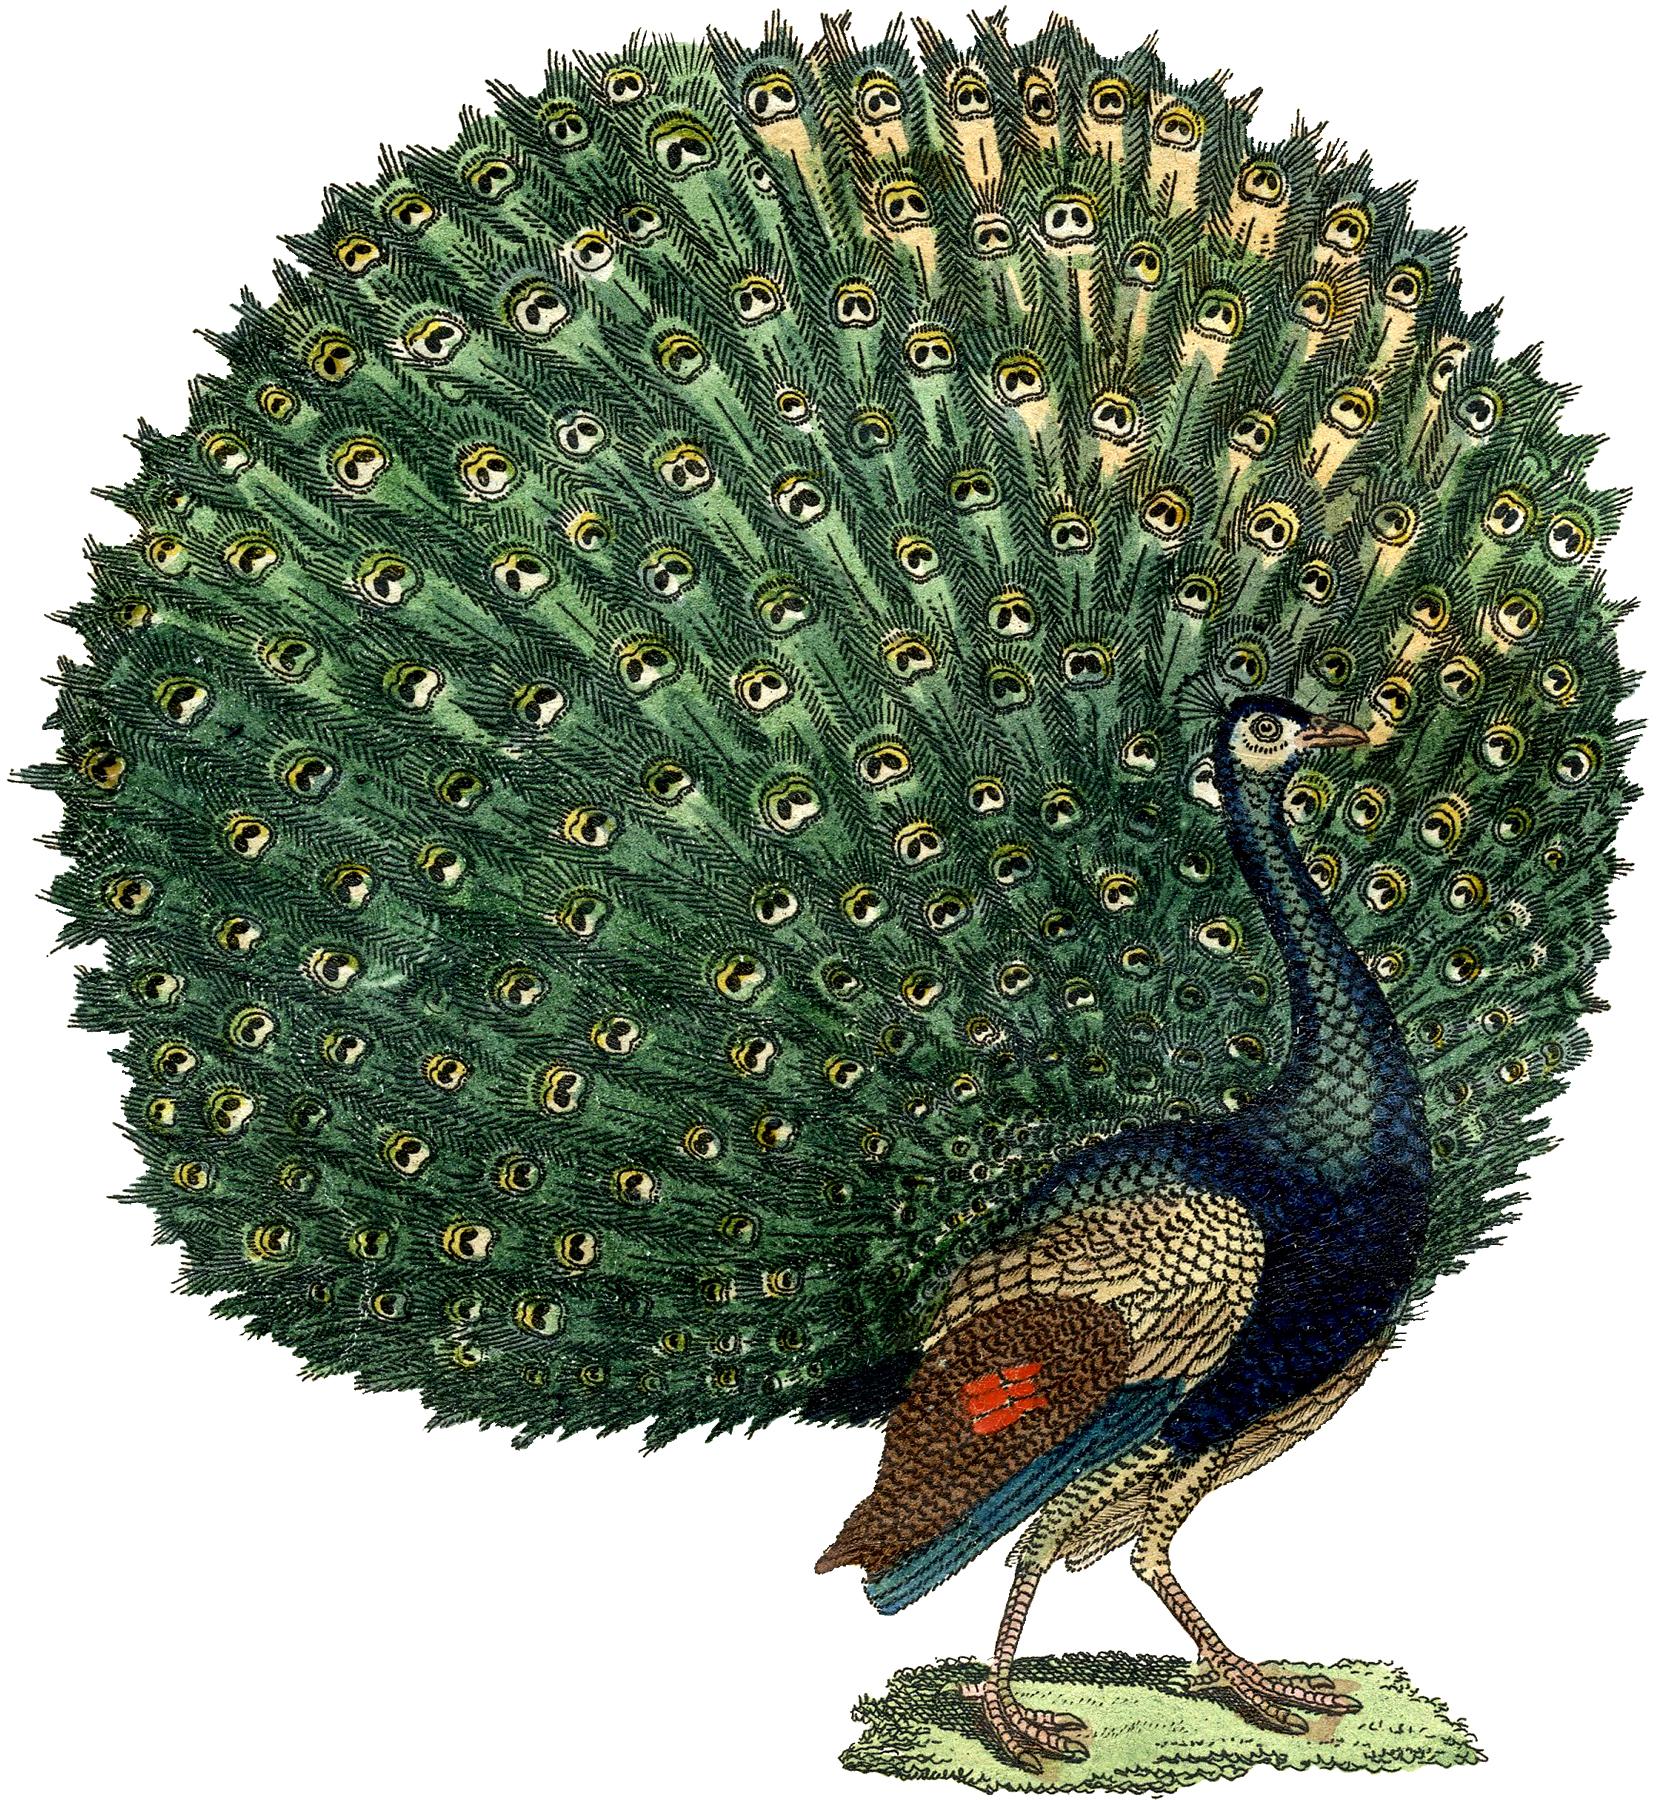 Fabulous Free Public Domain Peacock Image!